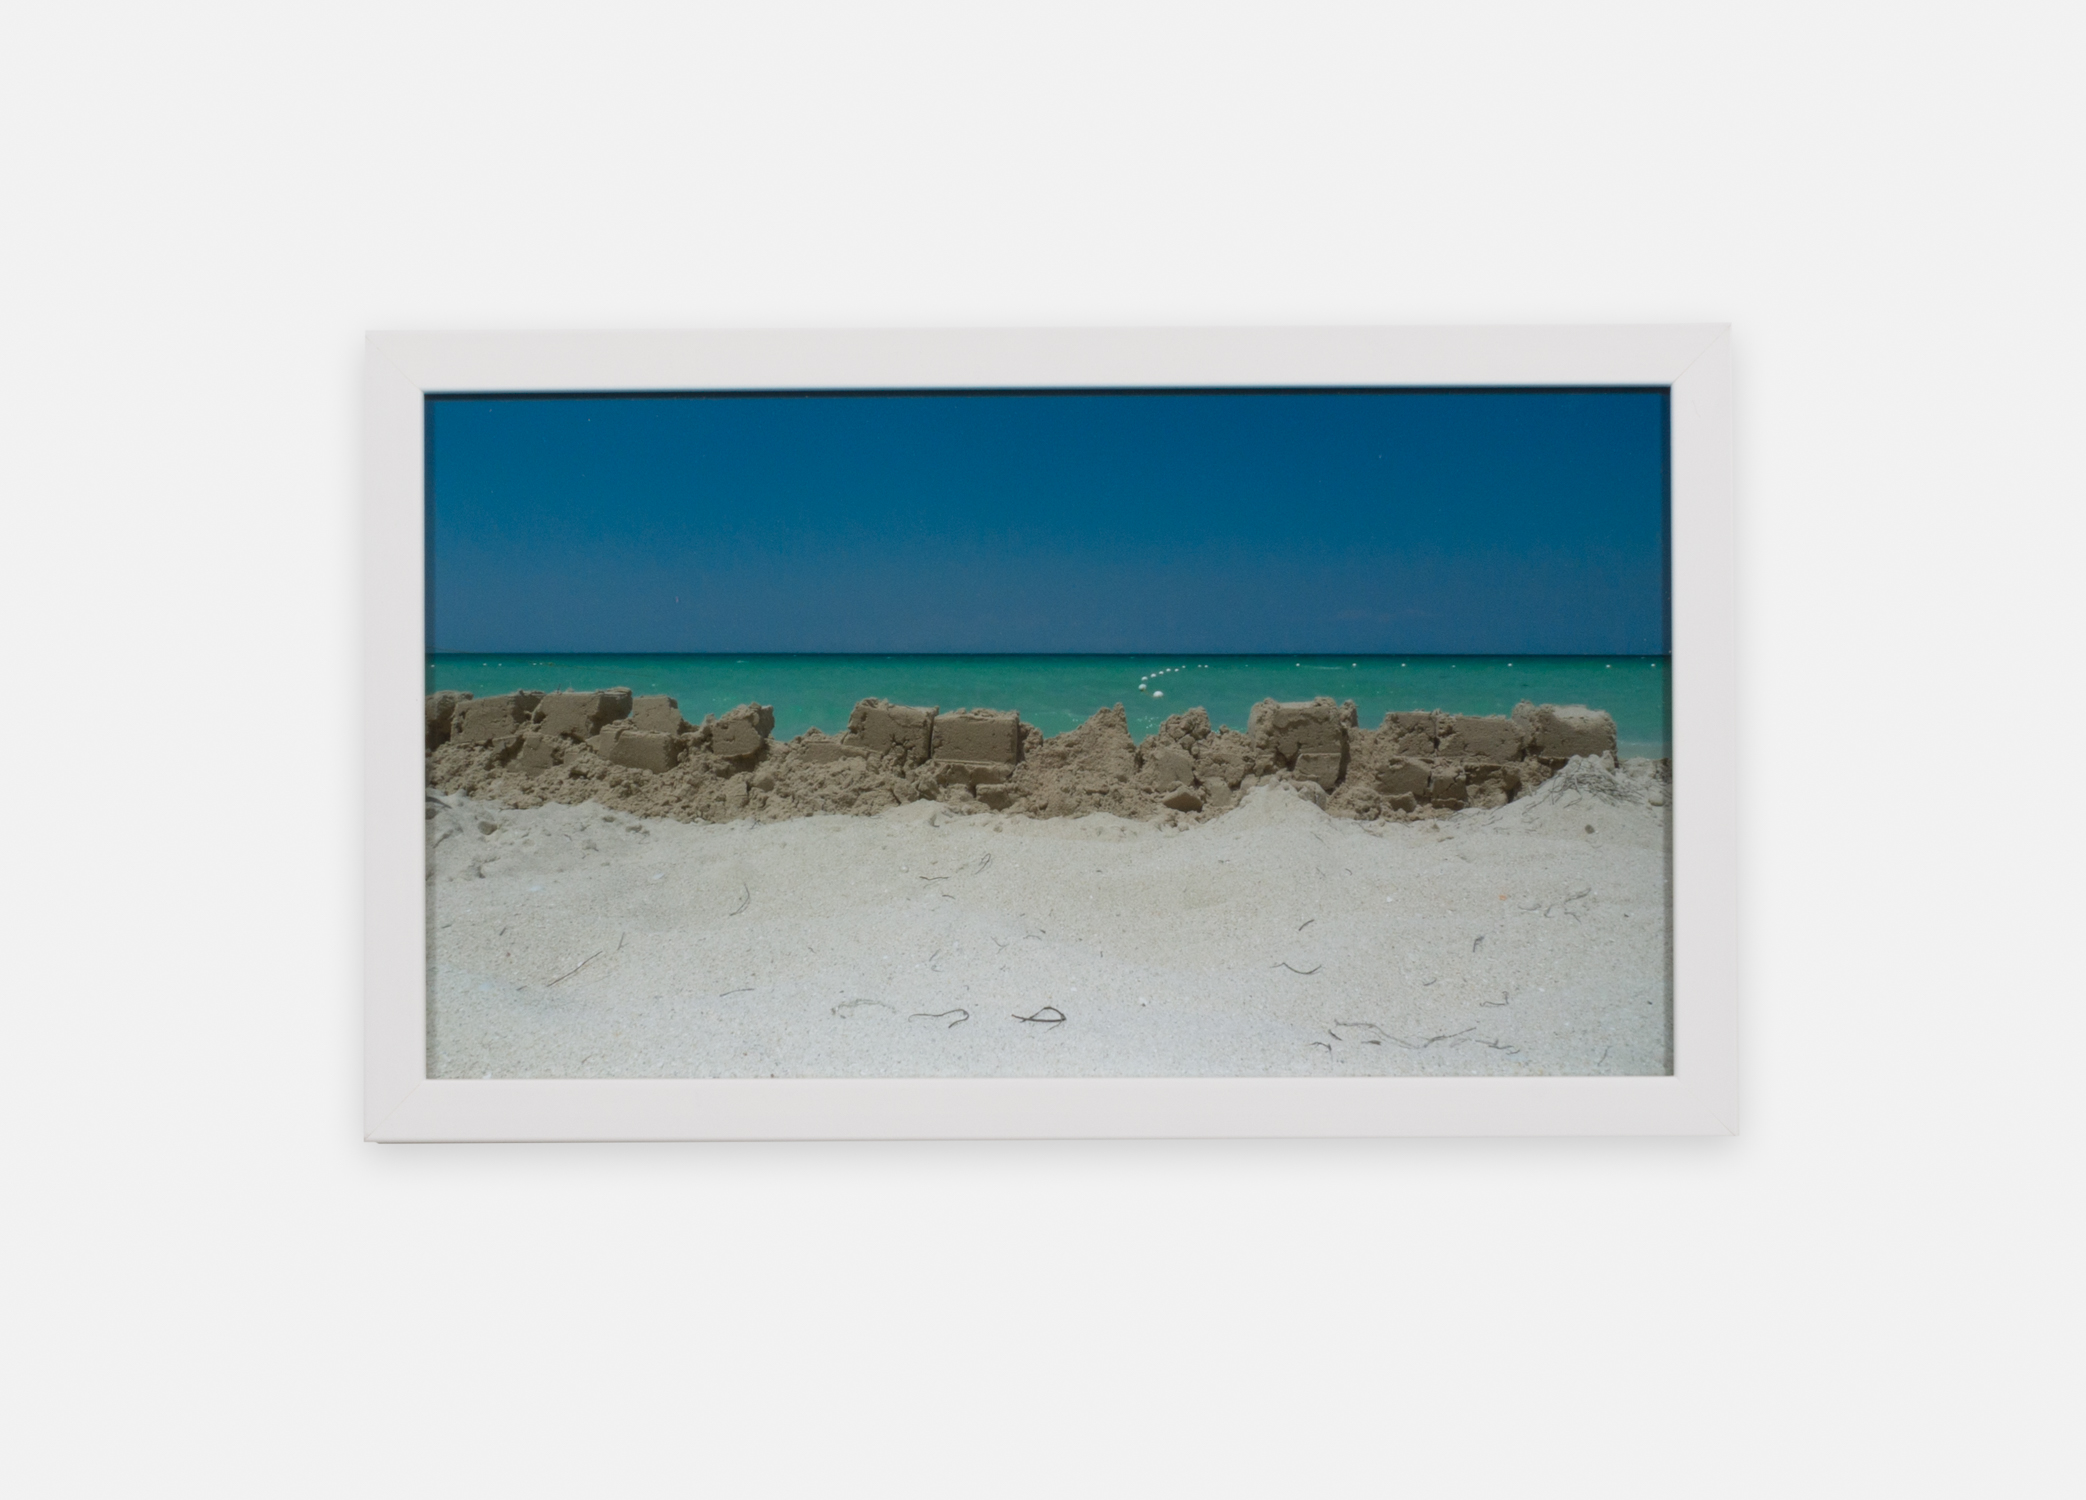 Eliza Myrie  Sandwall, Negril  2015 Digital photograph 8 ½h x 15w in (artwork); 10h x 17w in (framed) 1 of 3 EM002